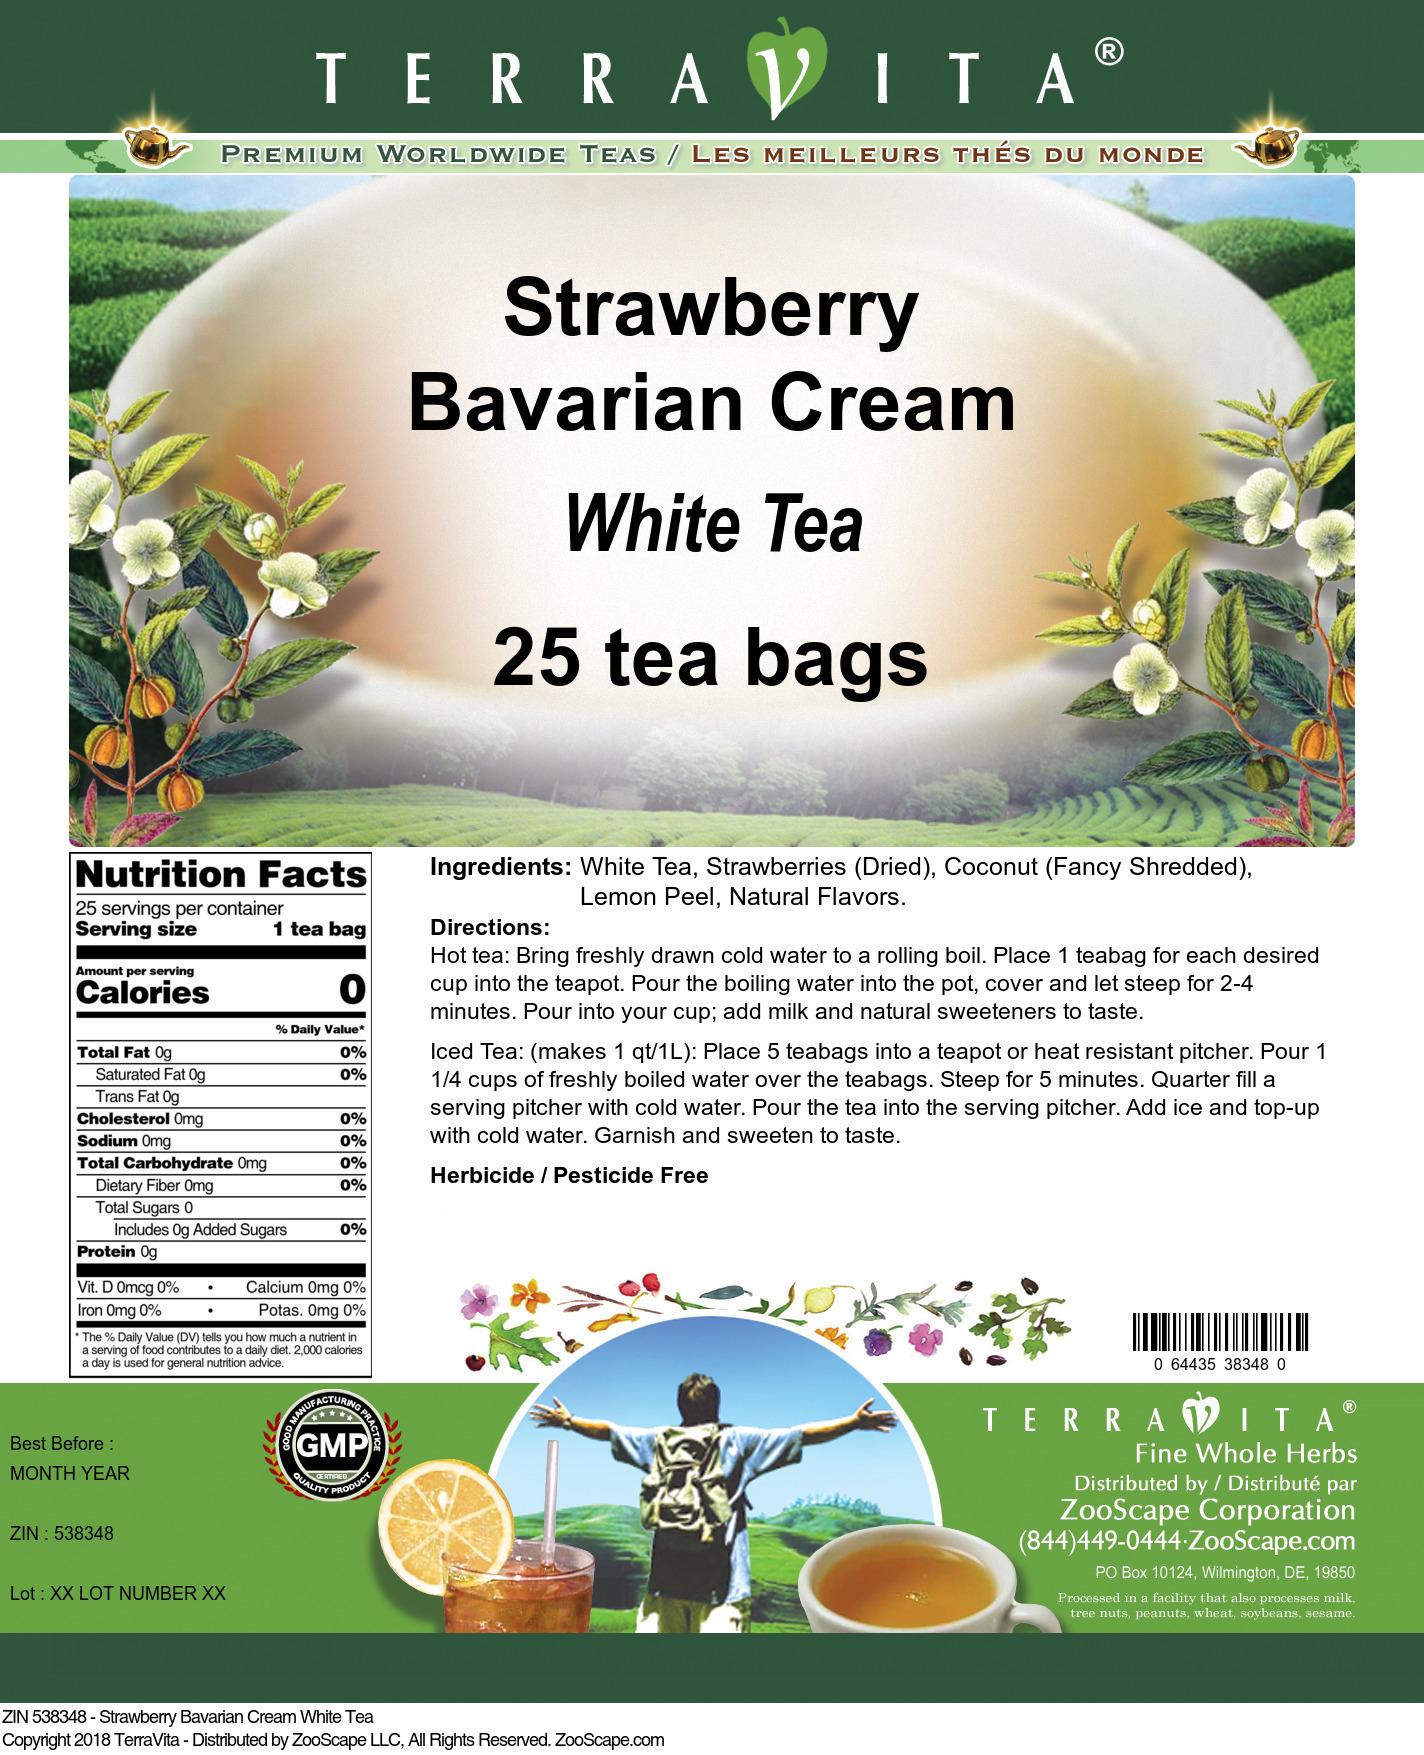 Strawberry Bavarian Cream White Tea